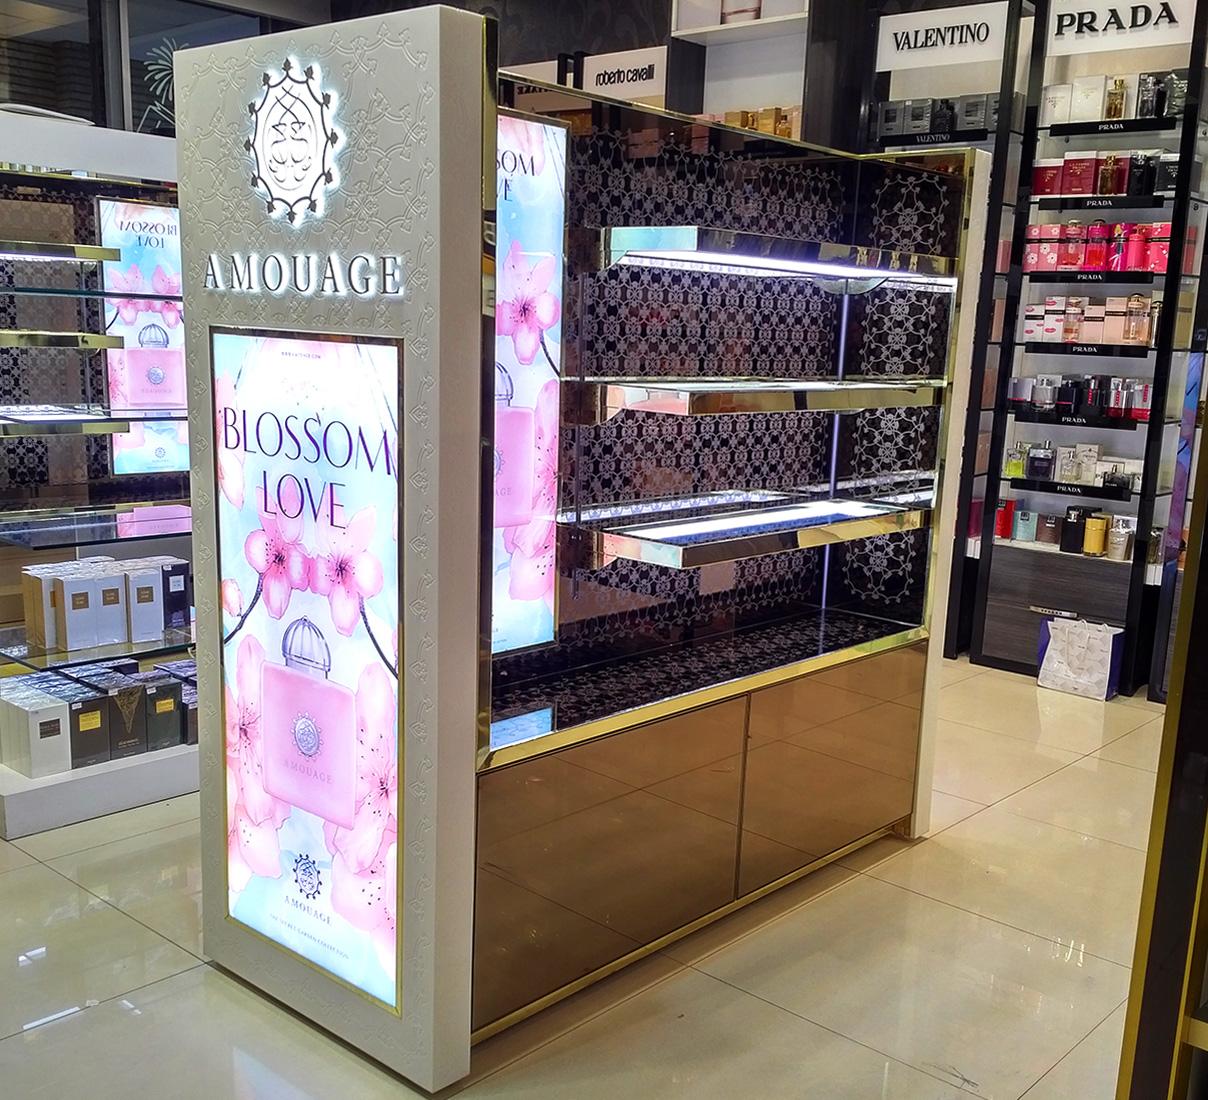 amouage-استند-عطر-فروشگاهی-نمایشگاهی-طراحی